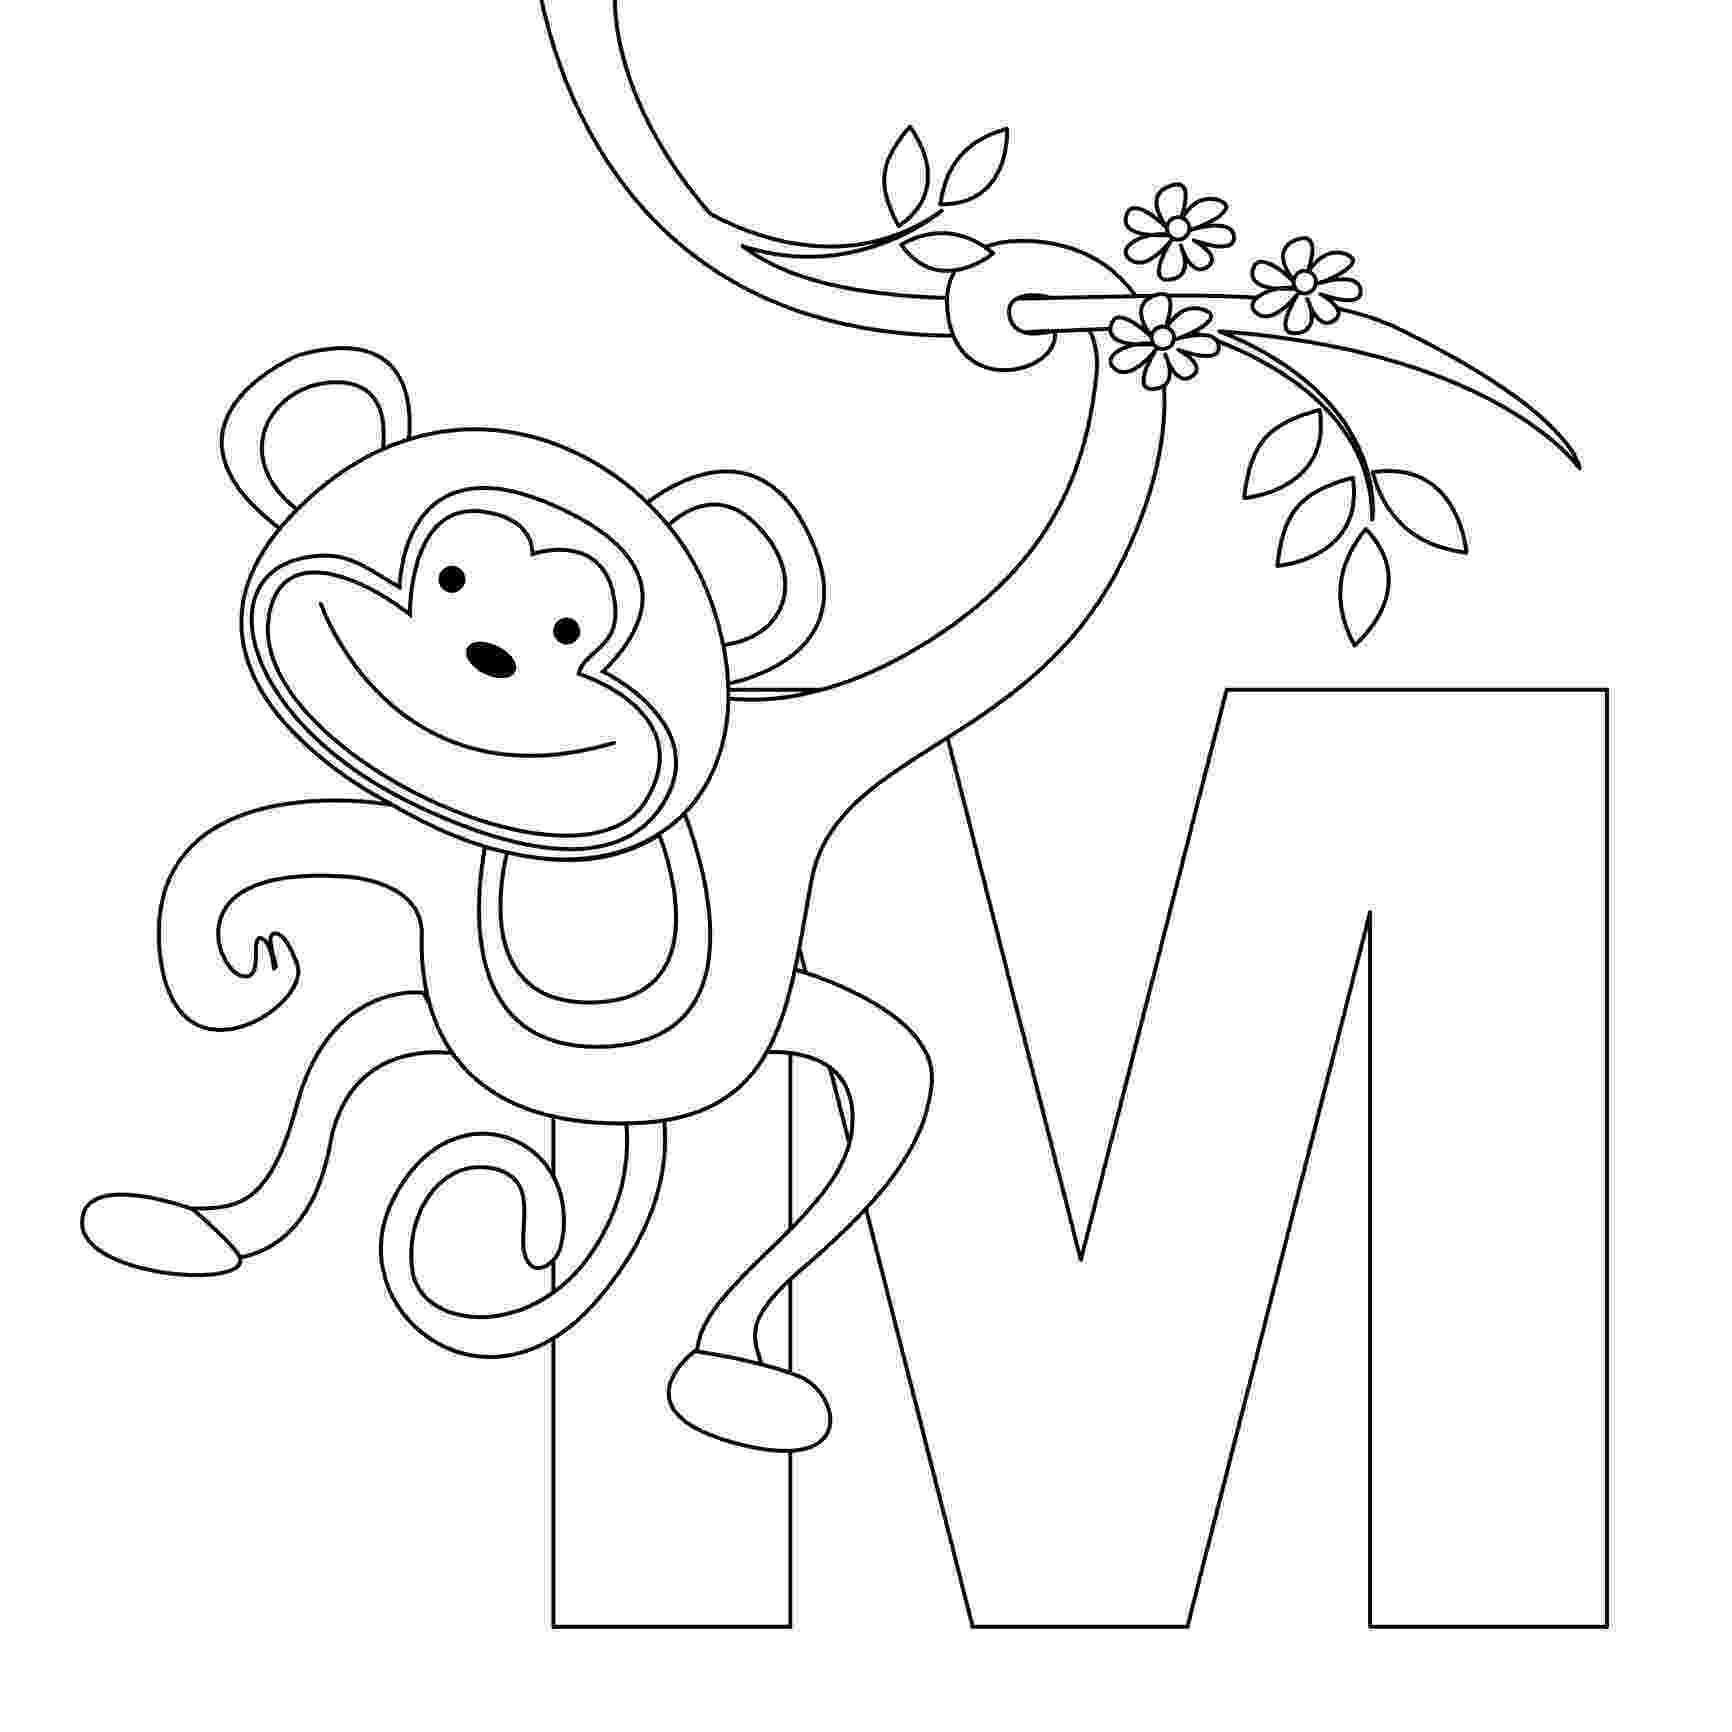 coloring animal alphabet free printable alphabet coloring pages for kids best animal alphabet coloring 1 1